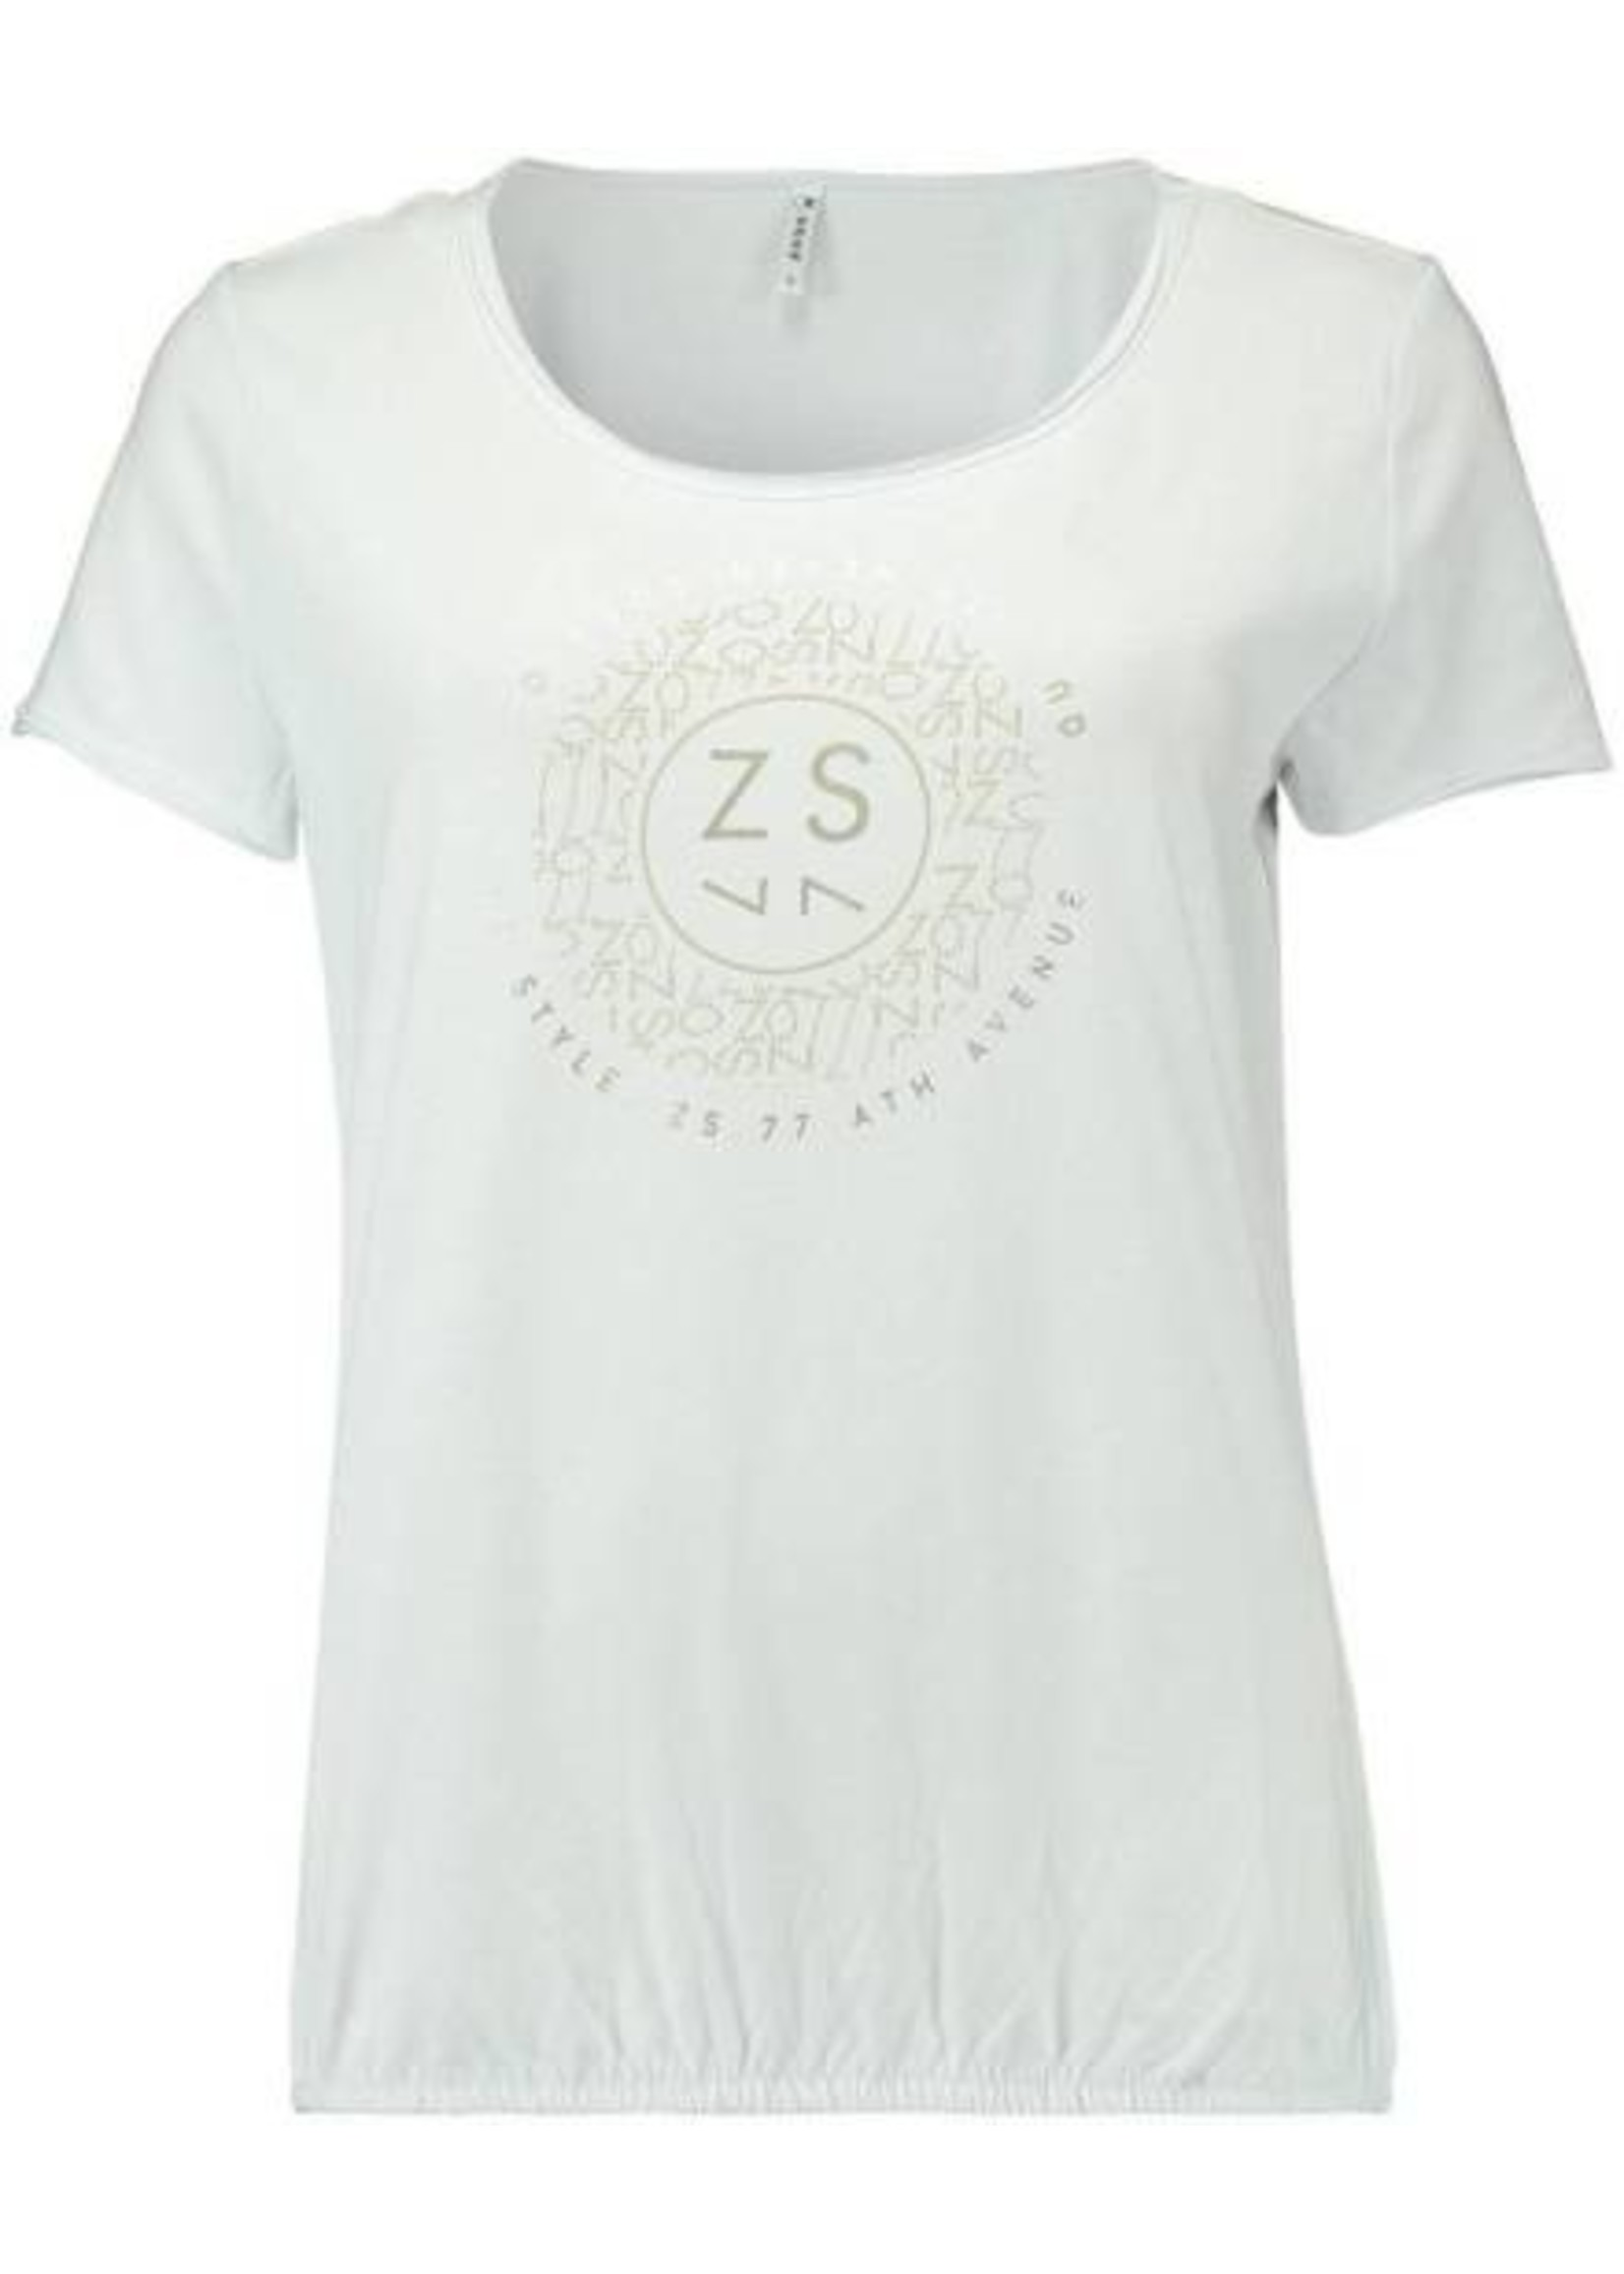 Zoso Daisy T shirt with print